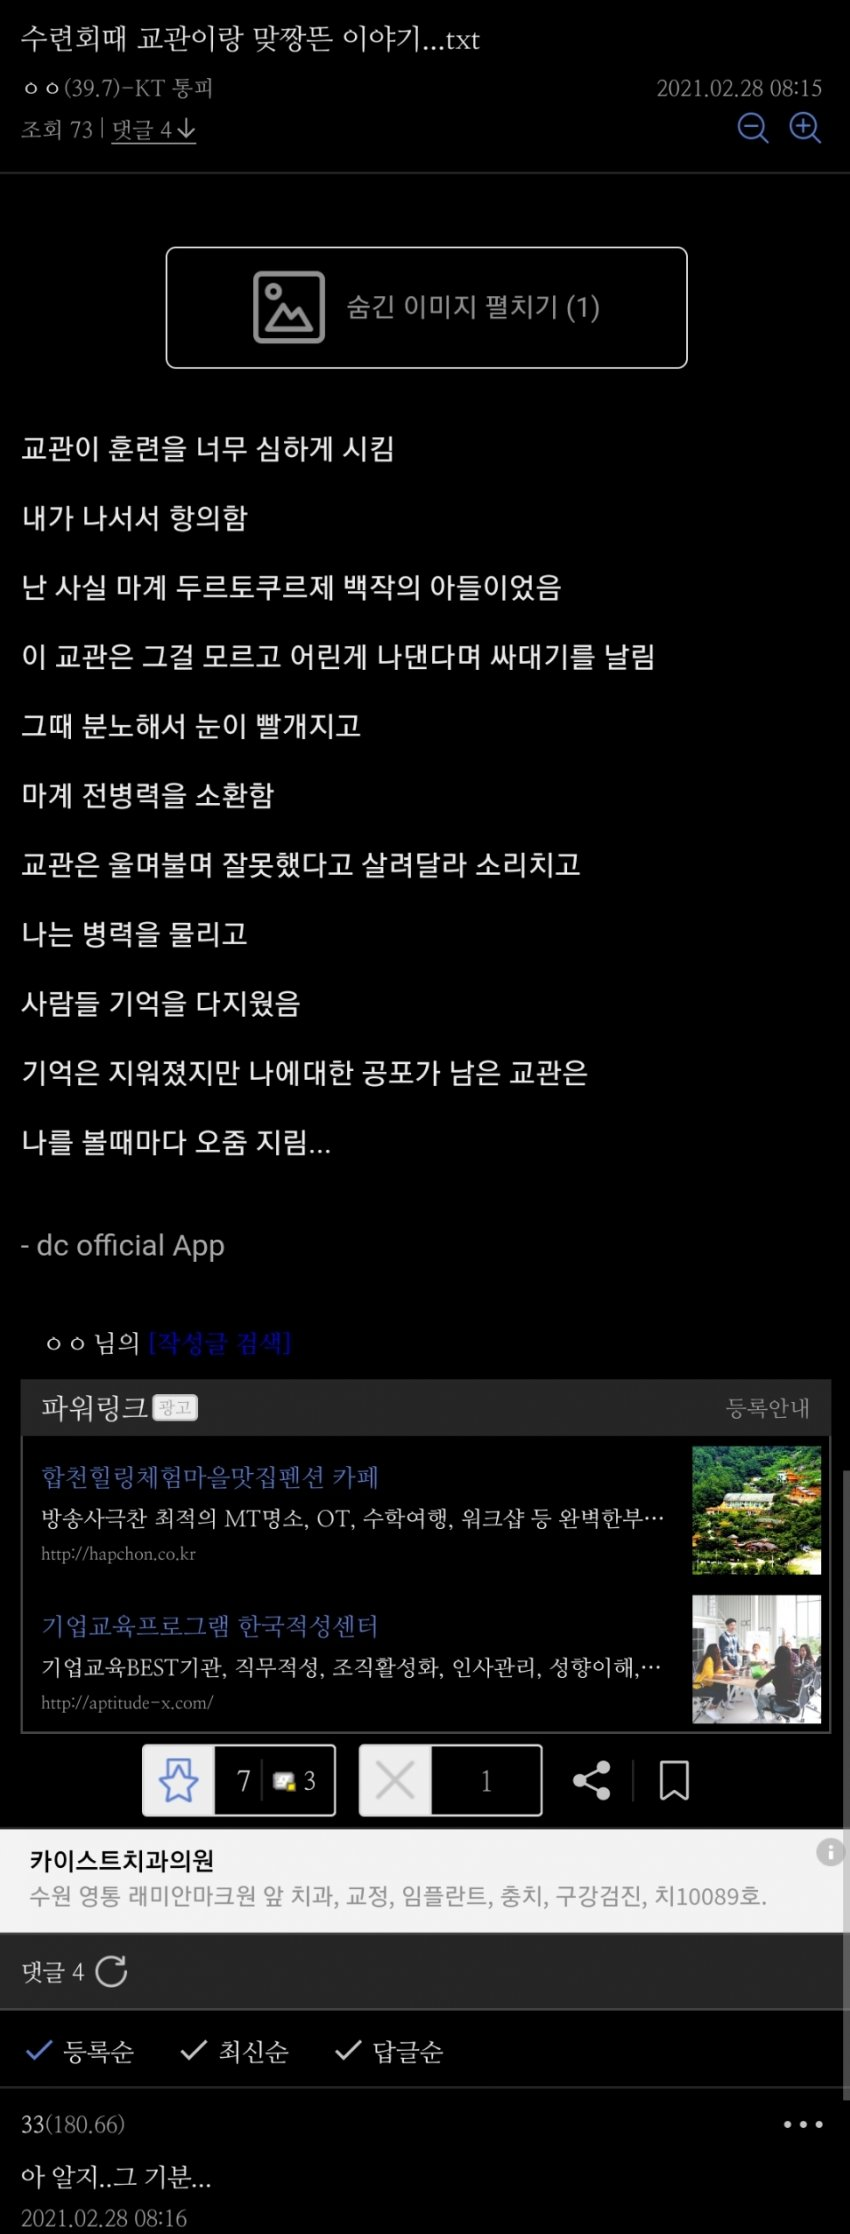 viewimage.php?id=25bcd827edd330a7&no=24b0d769e1d32ca73cec83fa11d0283146e1de228a7923f189a7bc55982b7e67d83f9bb61a95a9f01cac96f370d0f2670585ff461165e38d6fb156ed5c3f2497d6ca465a5e92b390f45058c1d7dabbfaf3246ac9367173d0550fbaa73cb2